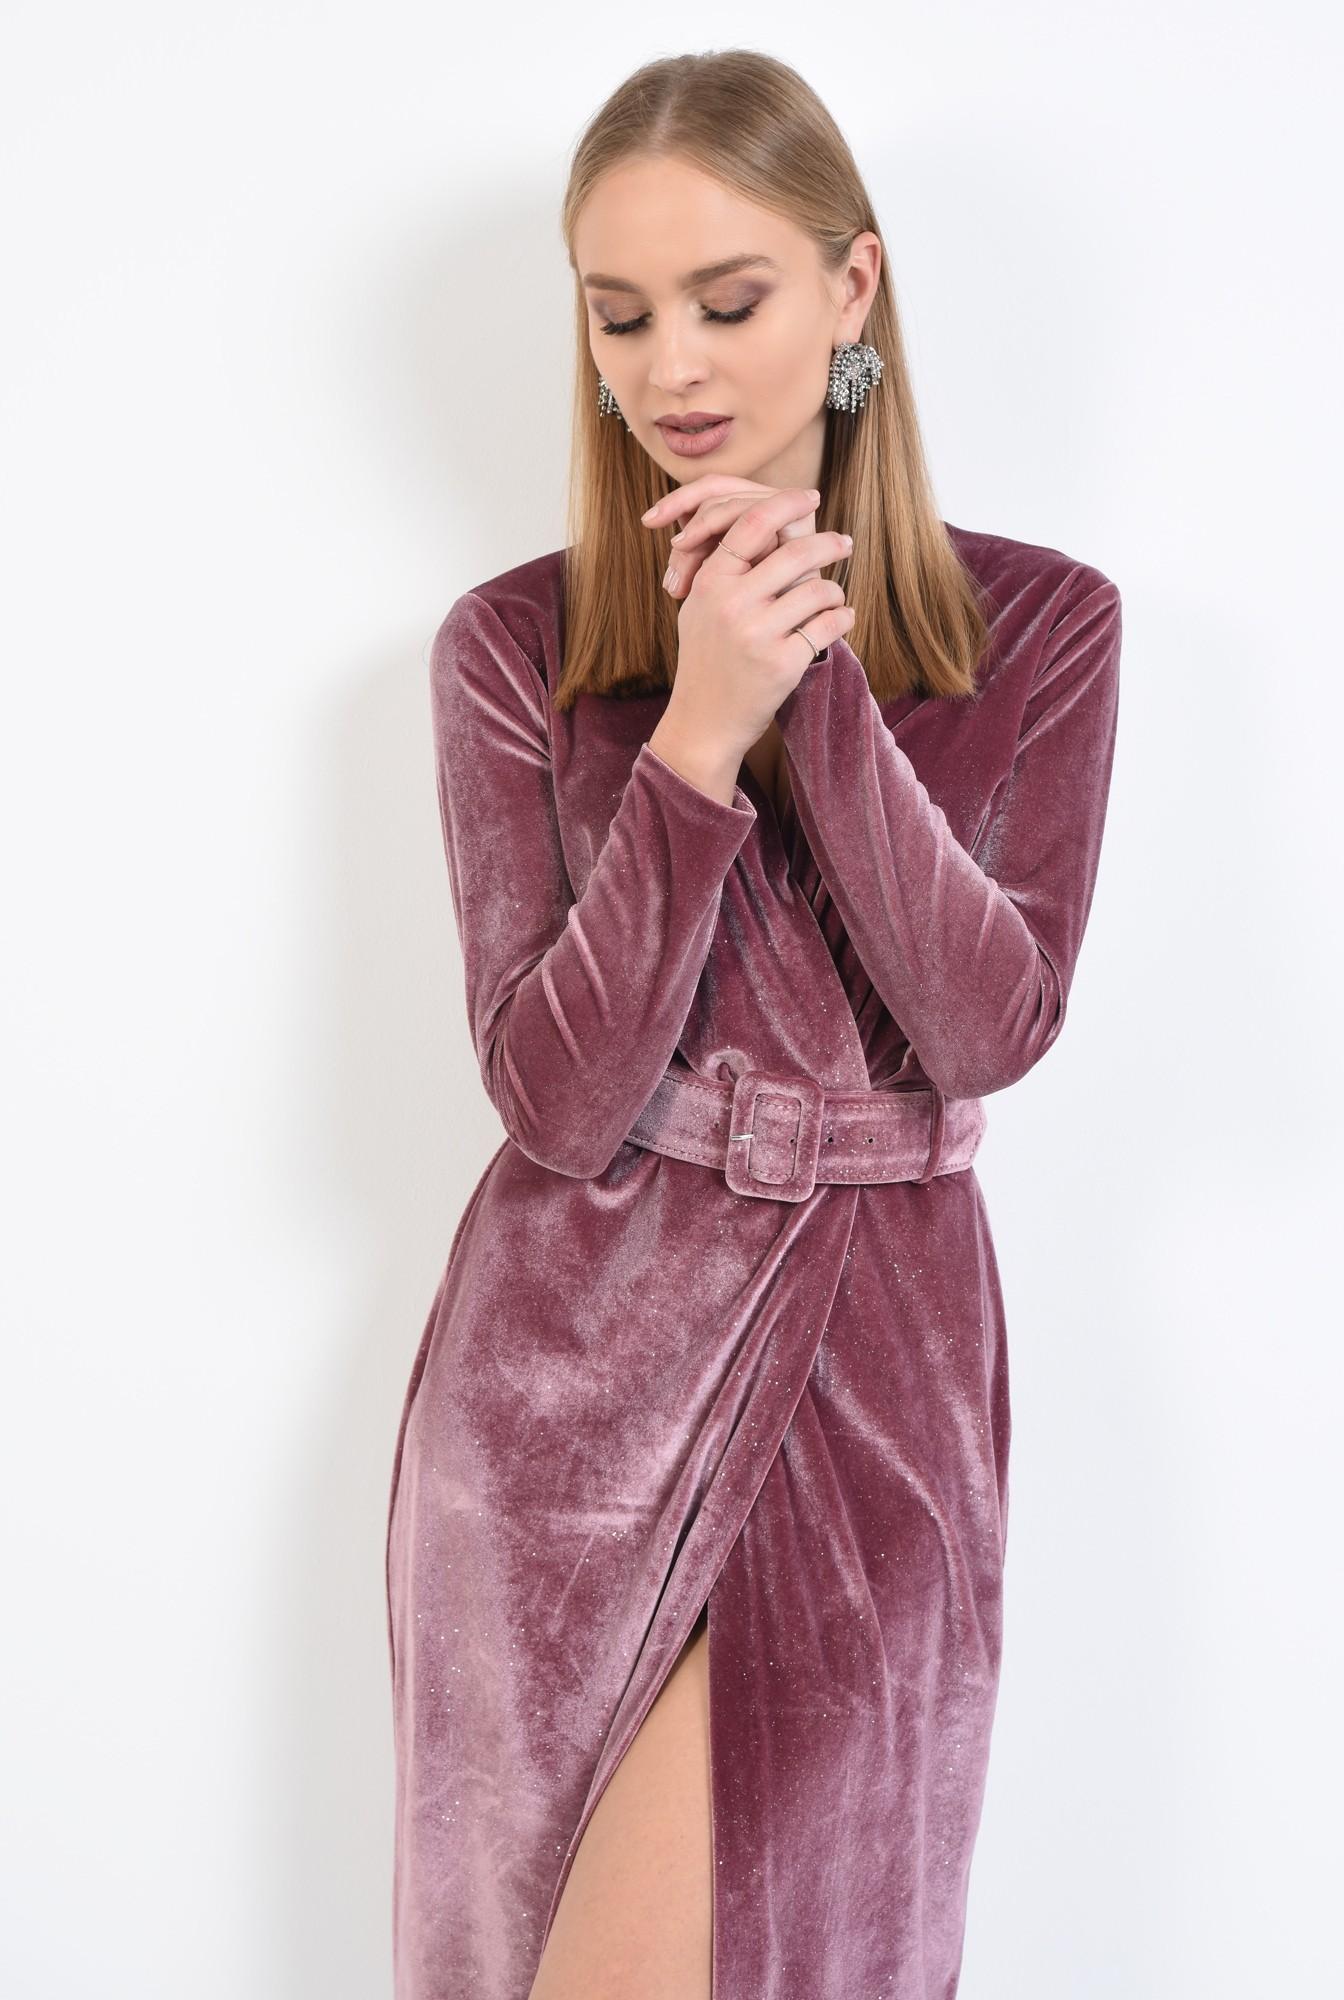 2 - 360 - rochie eleganta, croi conic, anchior petrecut, curea lata